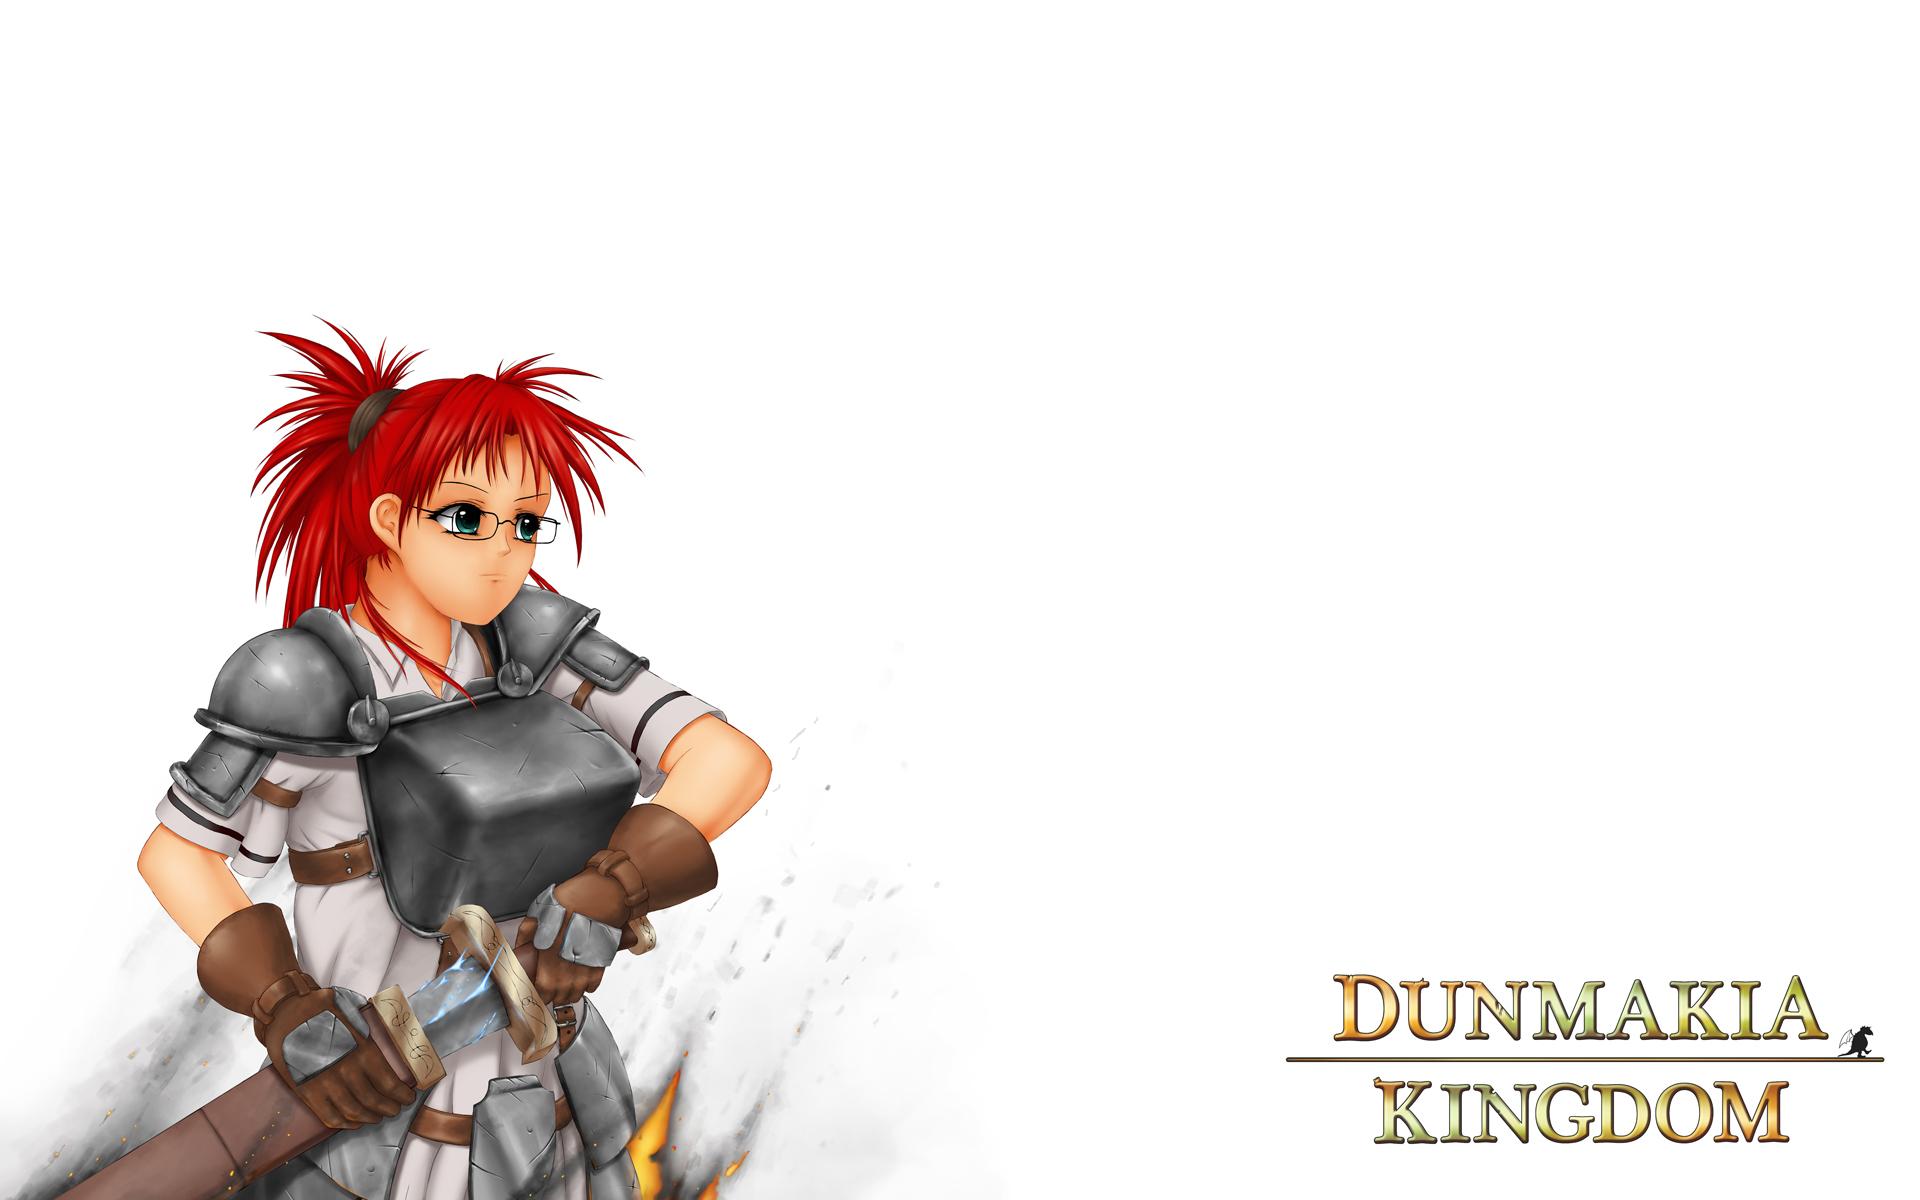 Dunmakia kingdom Wallpaper